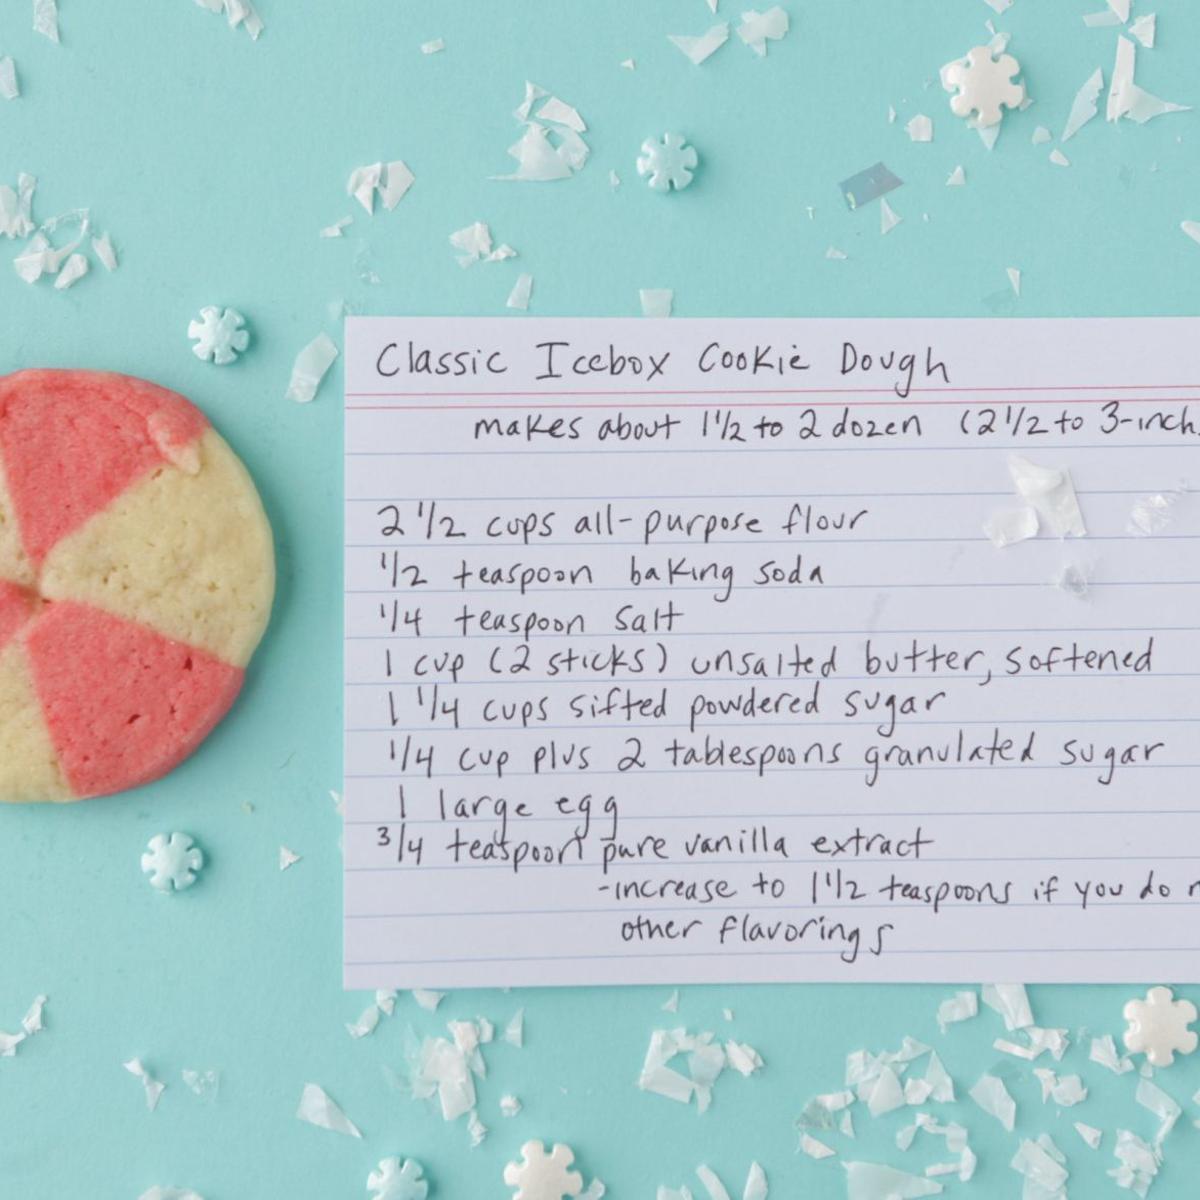 Beach Balls Classic Icebox Cookies Recipes Stltoday Com